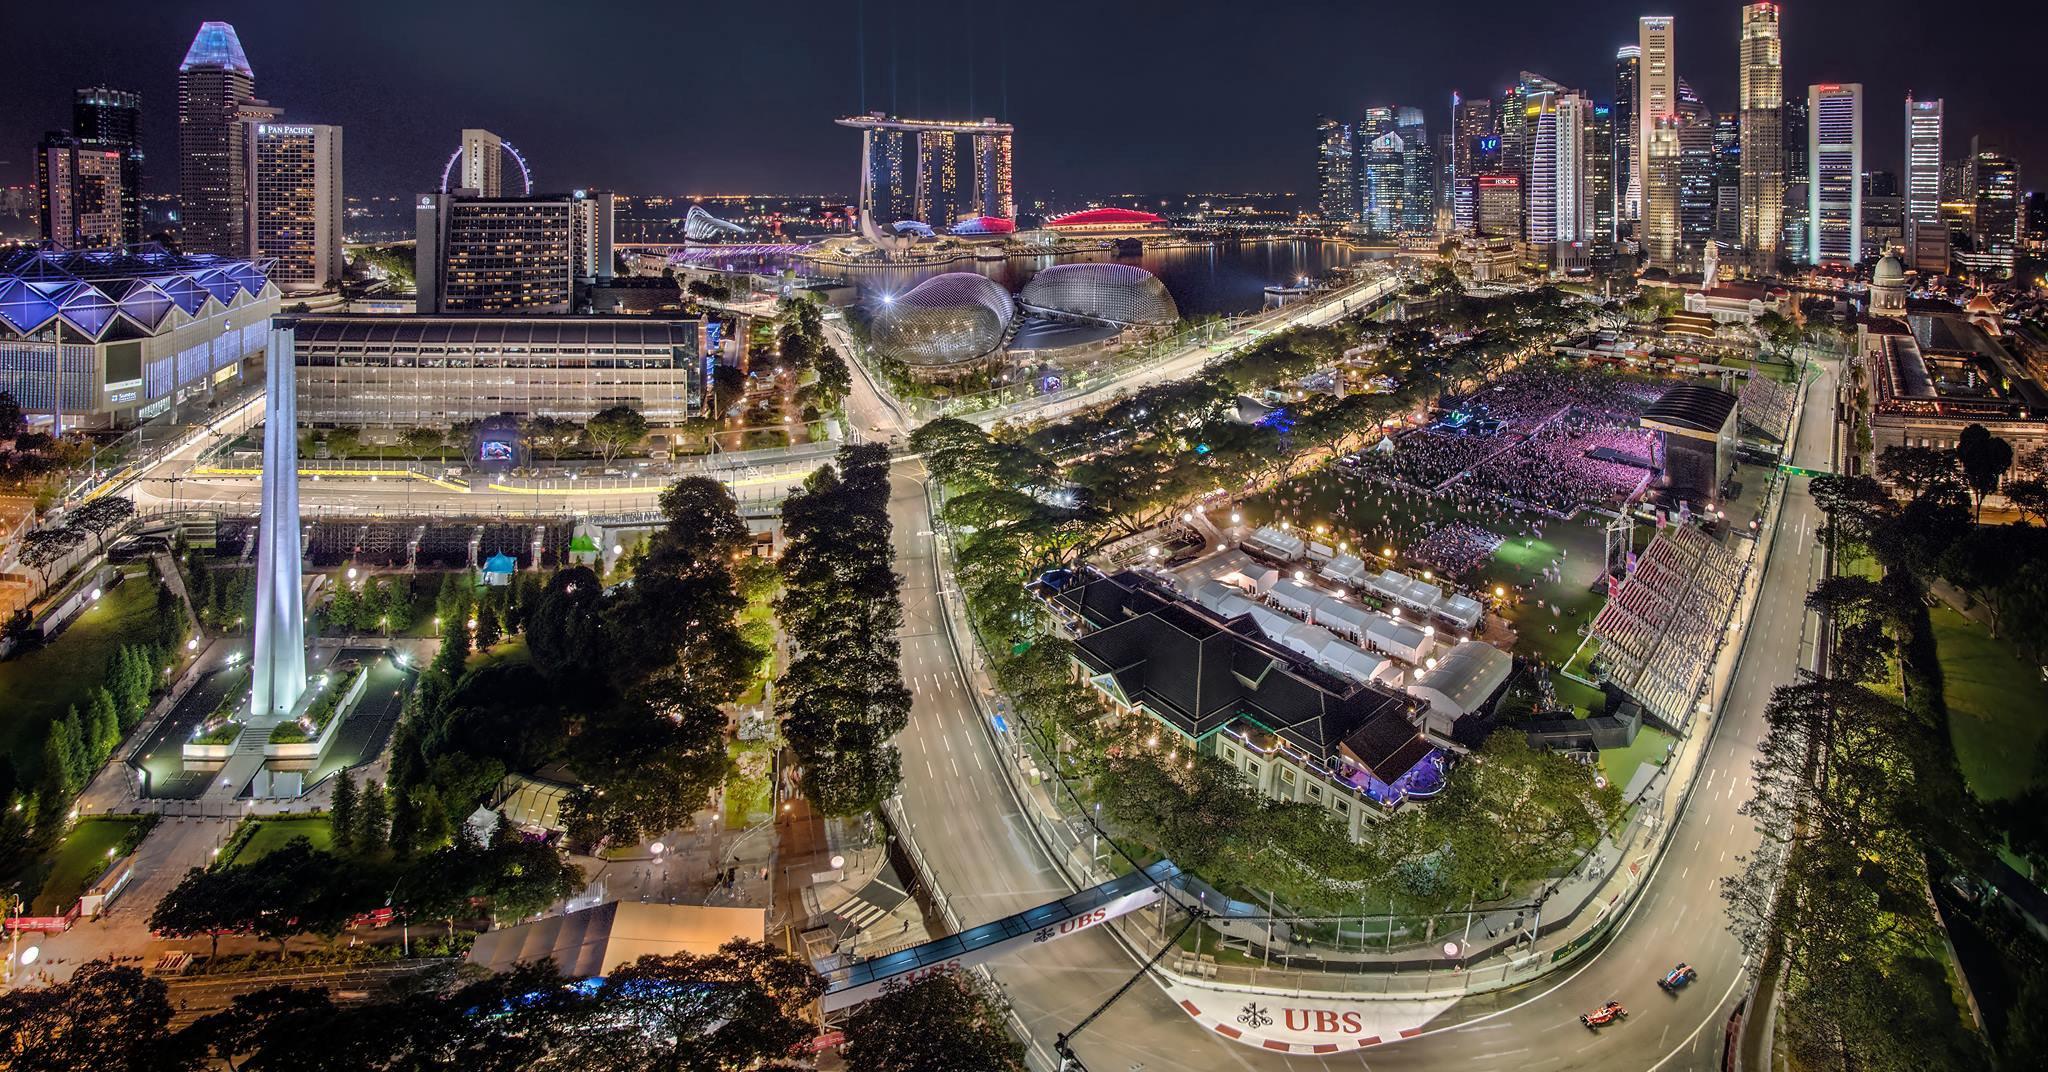 Singapore will continue hosting Formula 1 until 2021